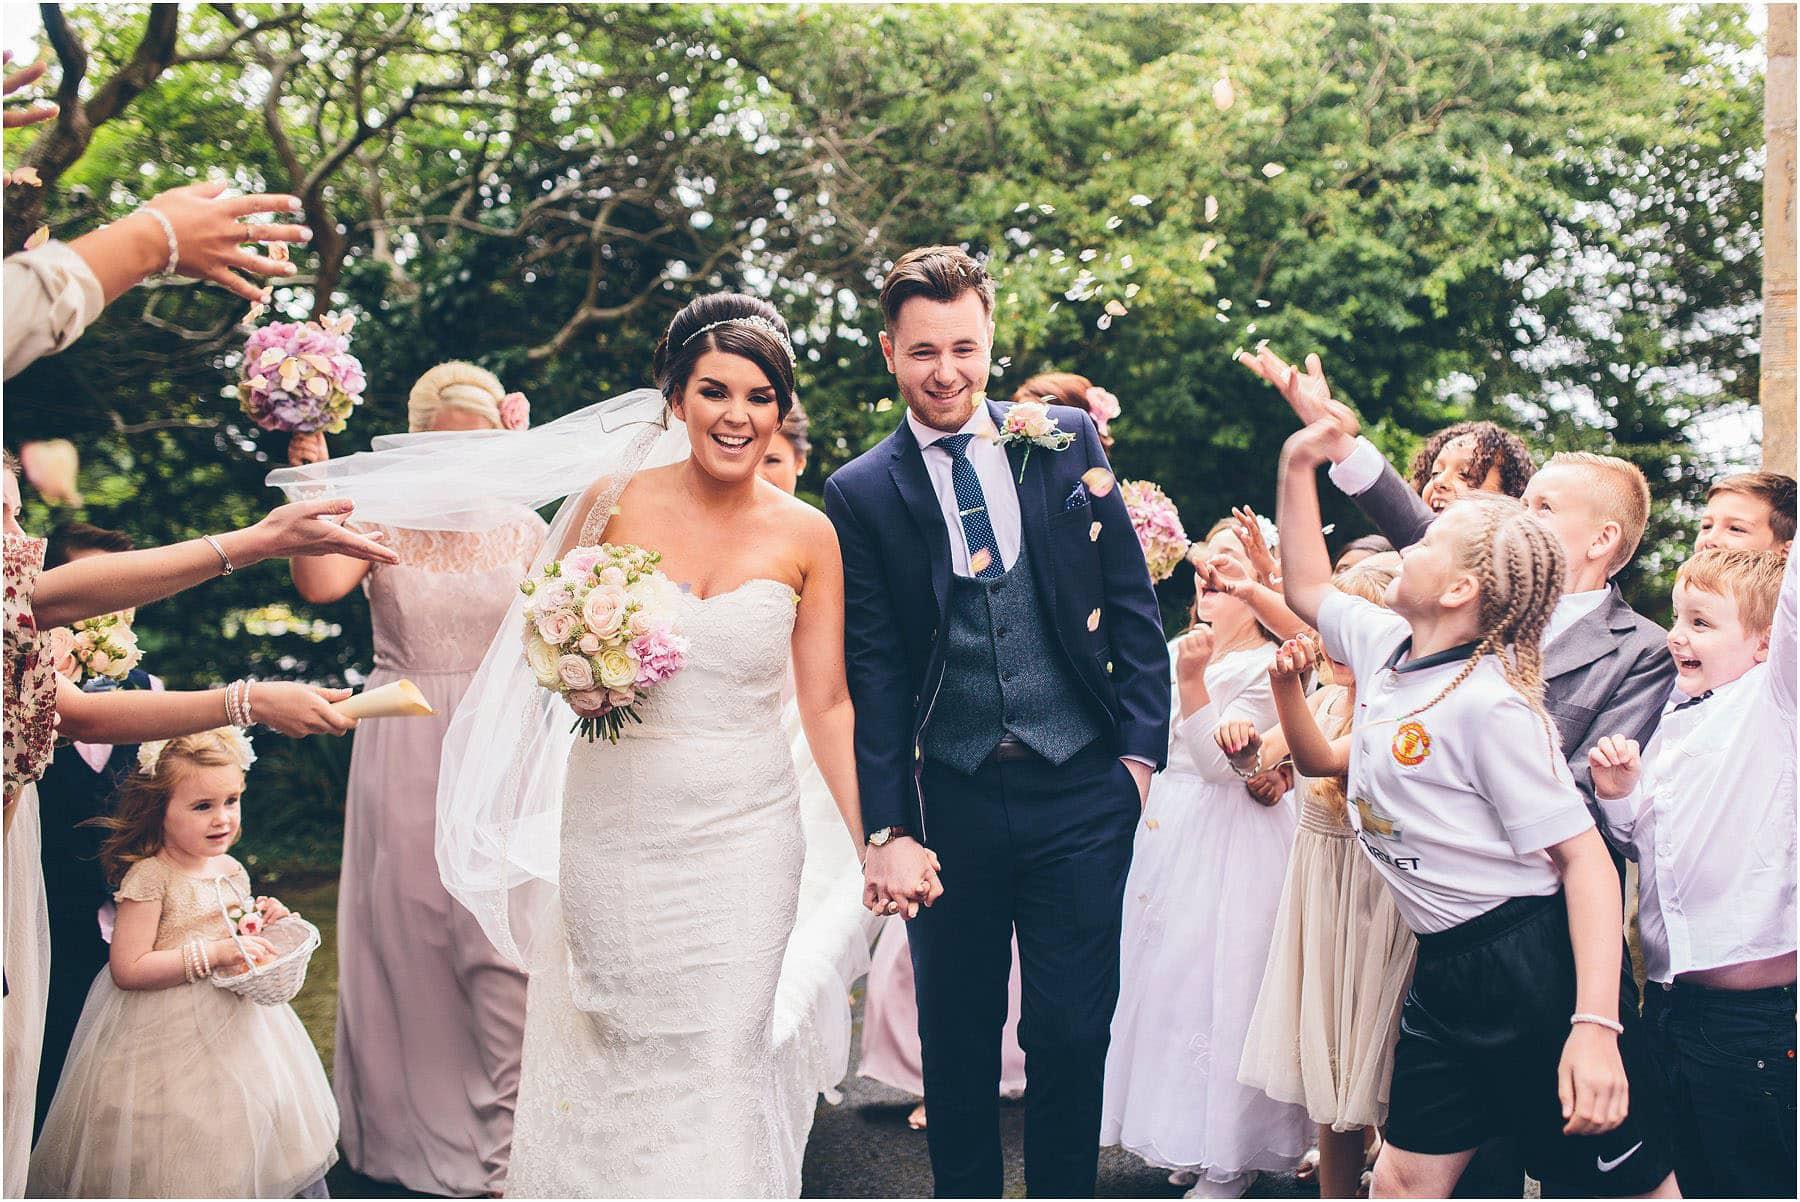 Soughton_Hall_Wedding_Photography_0069